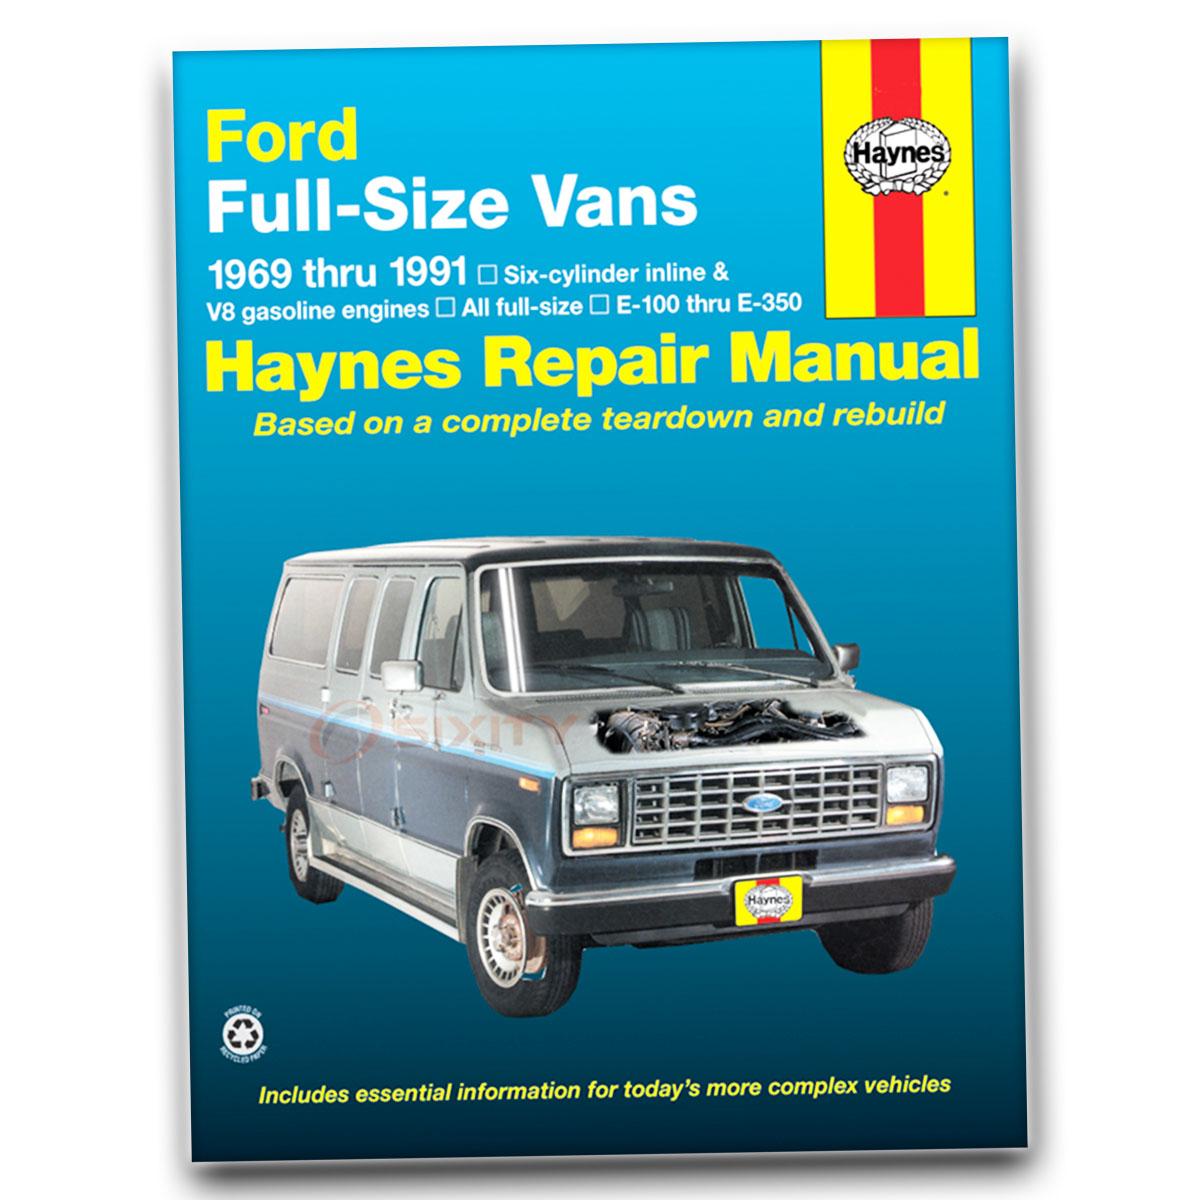 Haynes Repair Manual for Ford E-350 Econoline Club Wagon XLT Custom Base uh